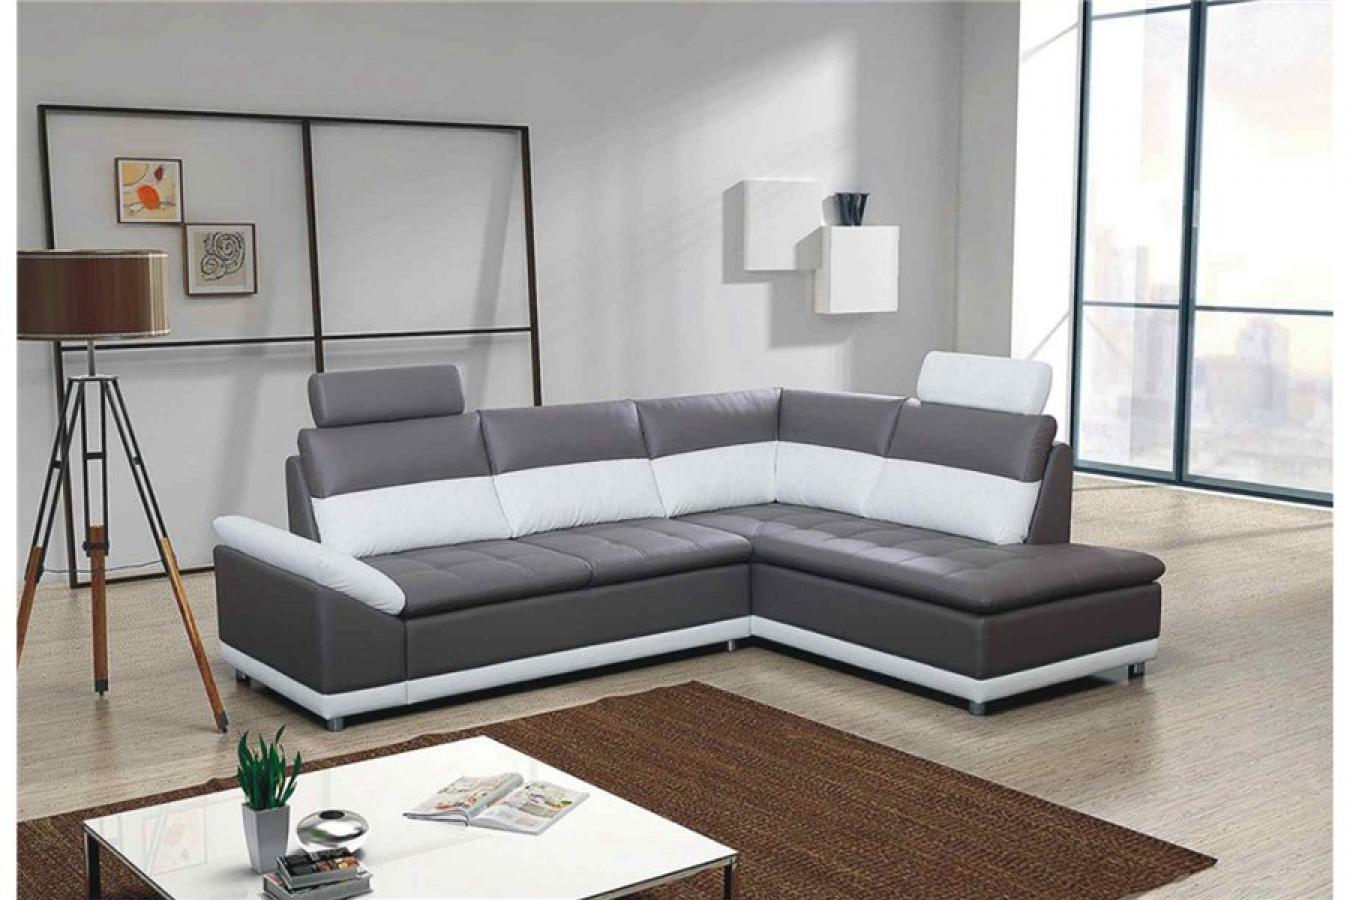 canap rapido ikea beautiful fauteuil club cuir ikea salon cuir ikea salon cuir marron fonce. Black Bedroom Furniture Sets. Home Design Ideas